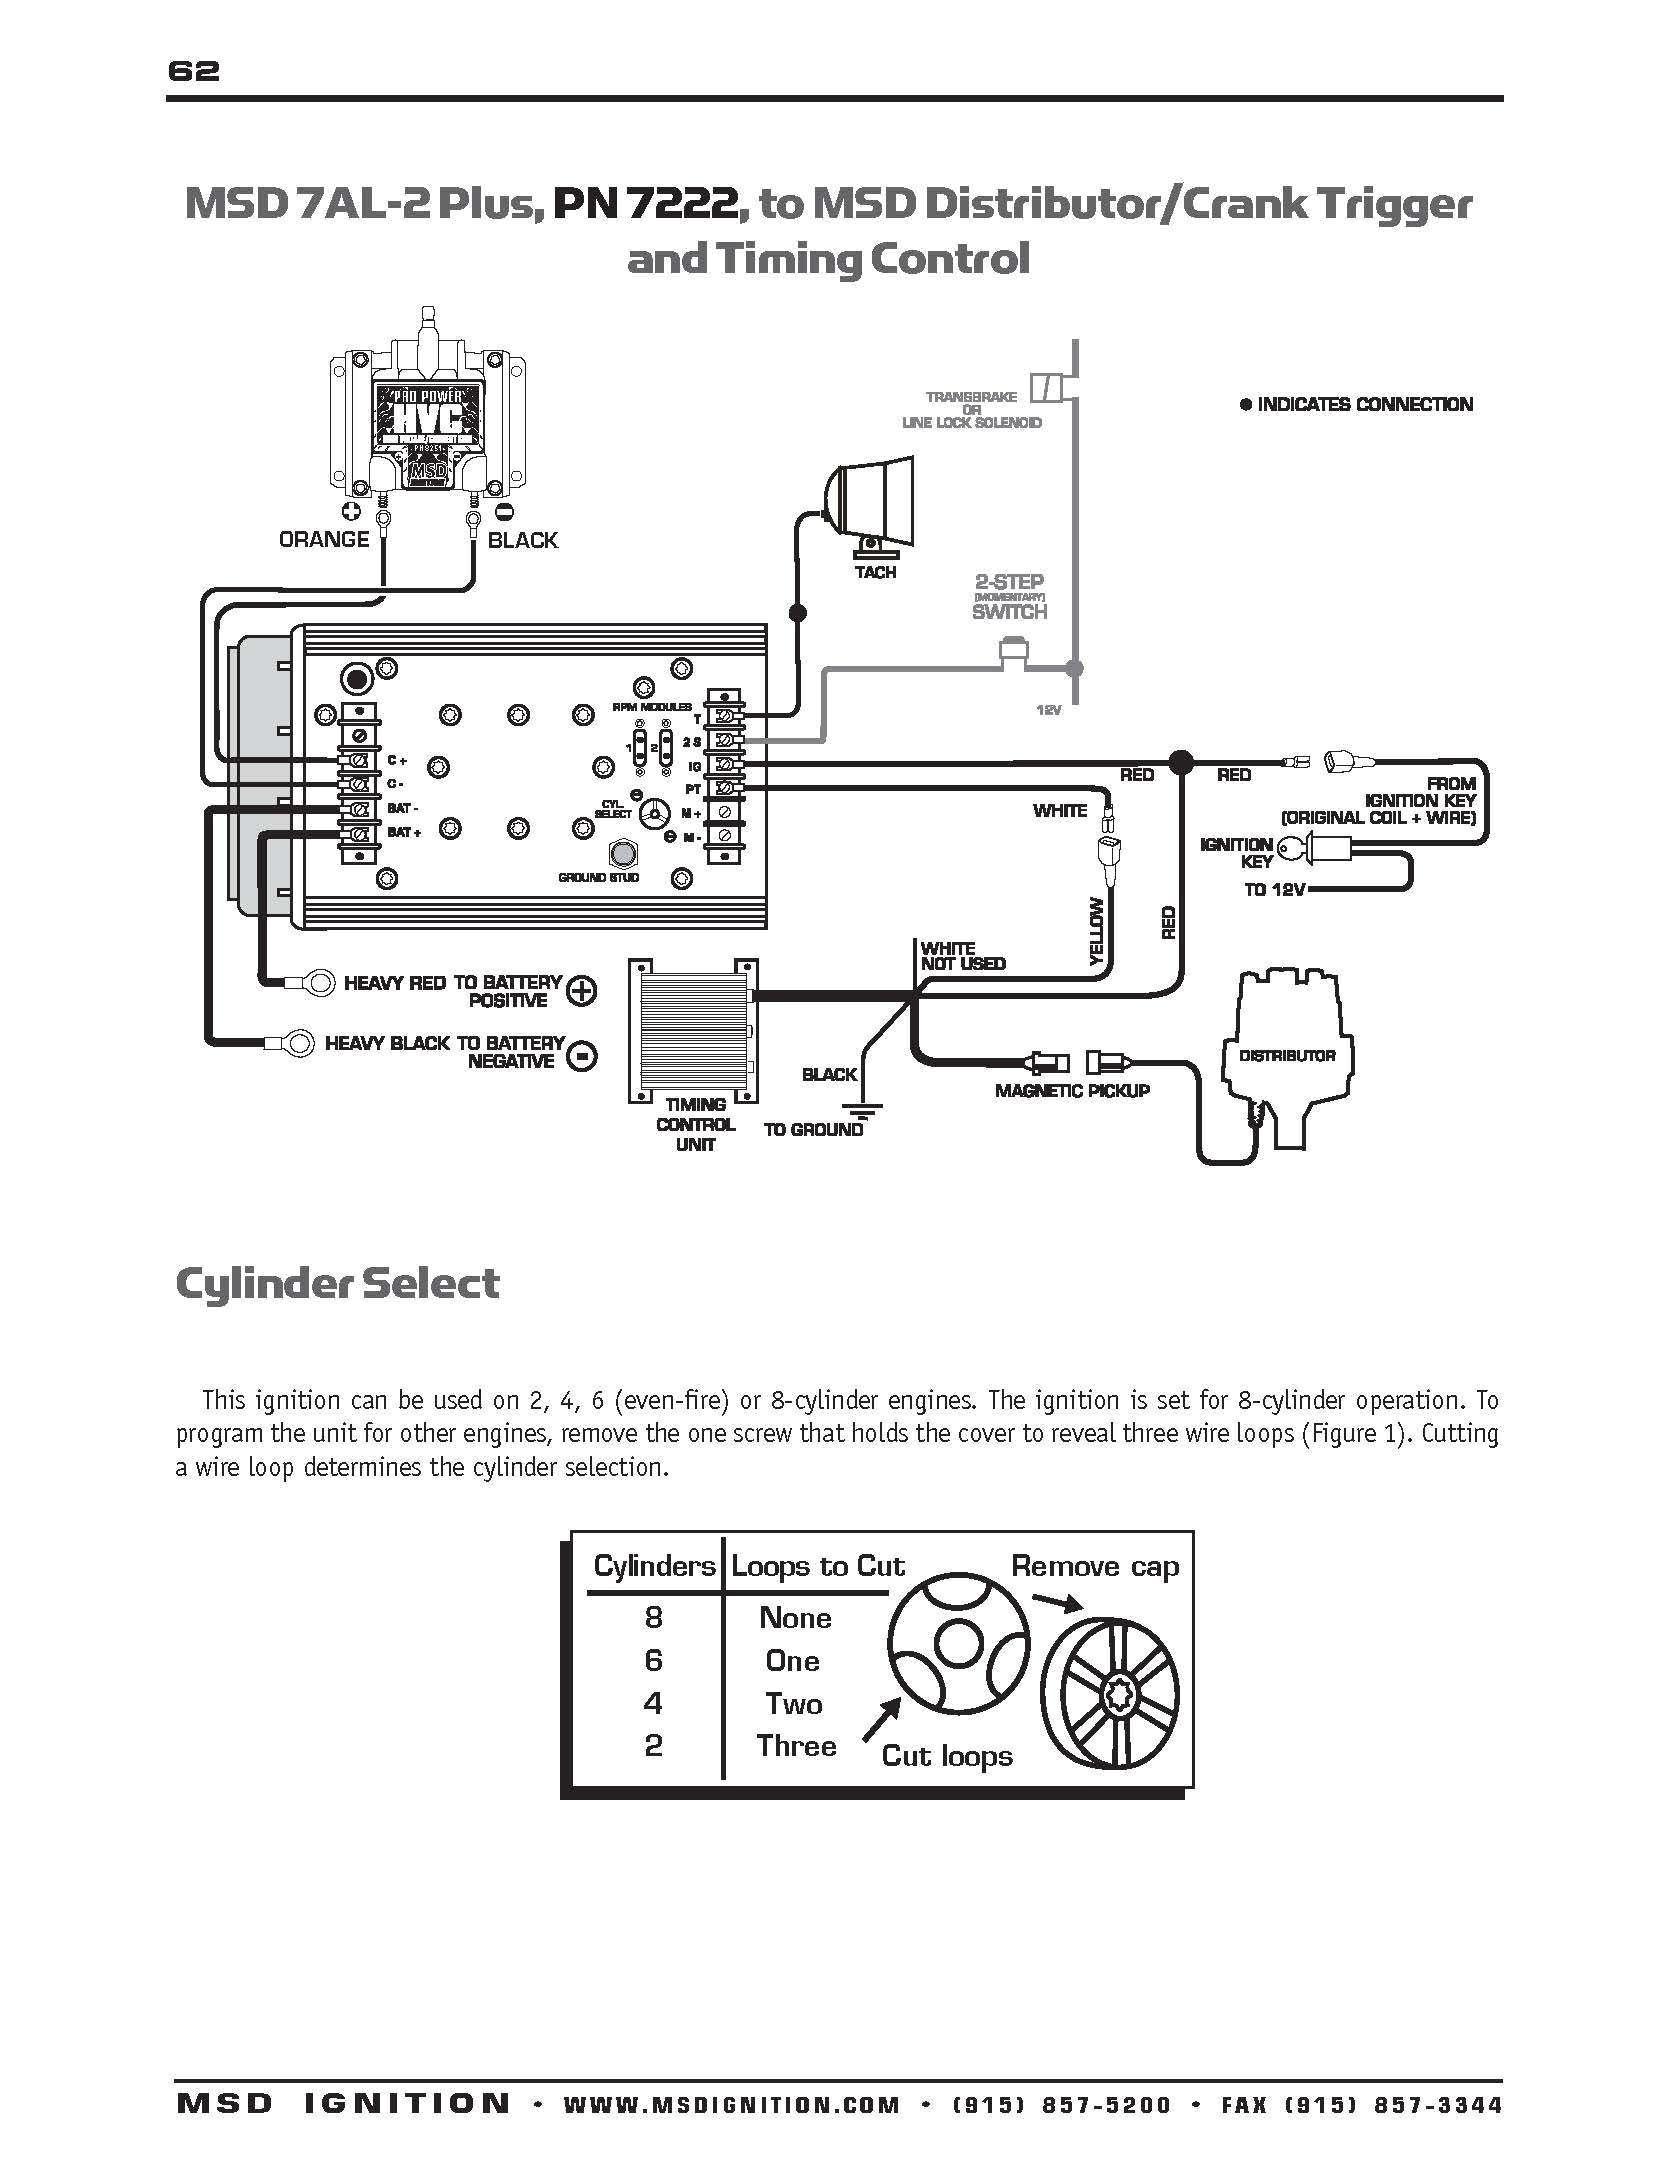 msd 7al wiring diagram wiring diagram for you msd 7al 2 wiring tachometer wiring diagram toolbox